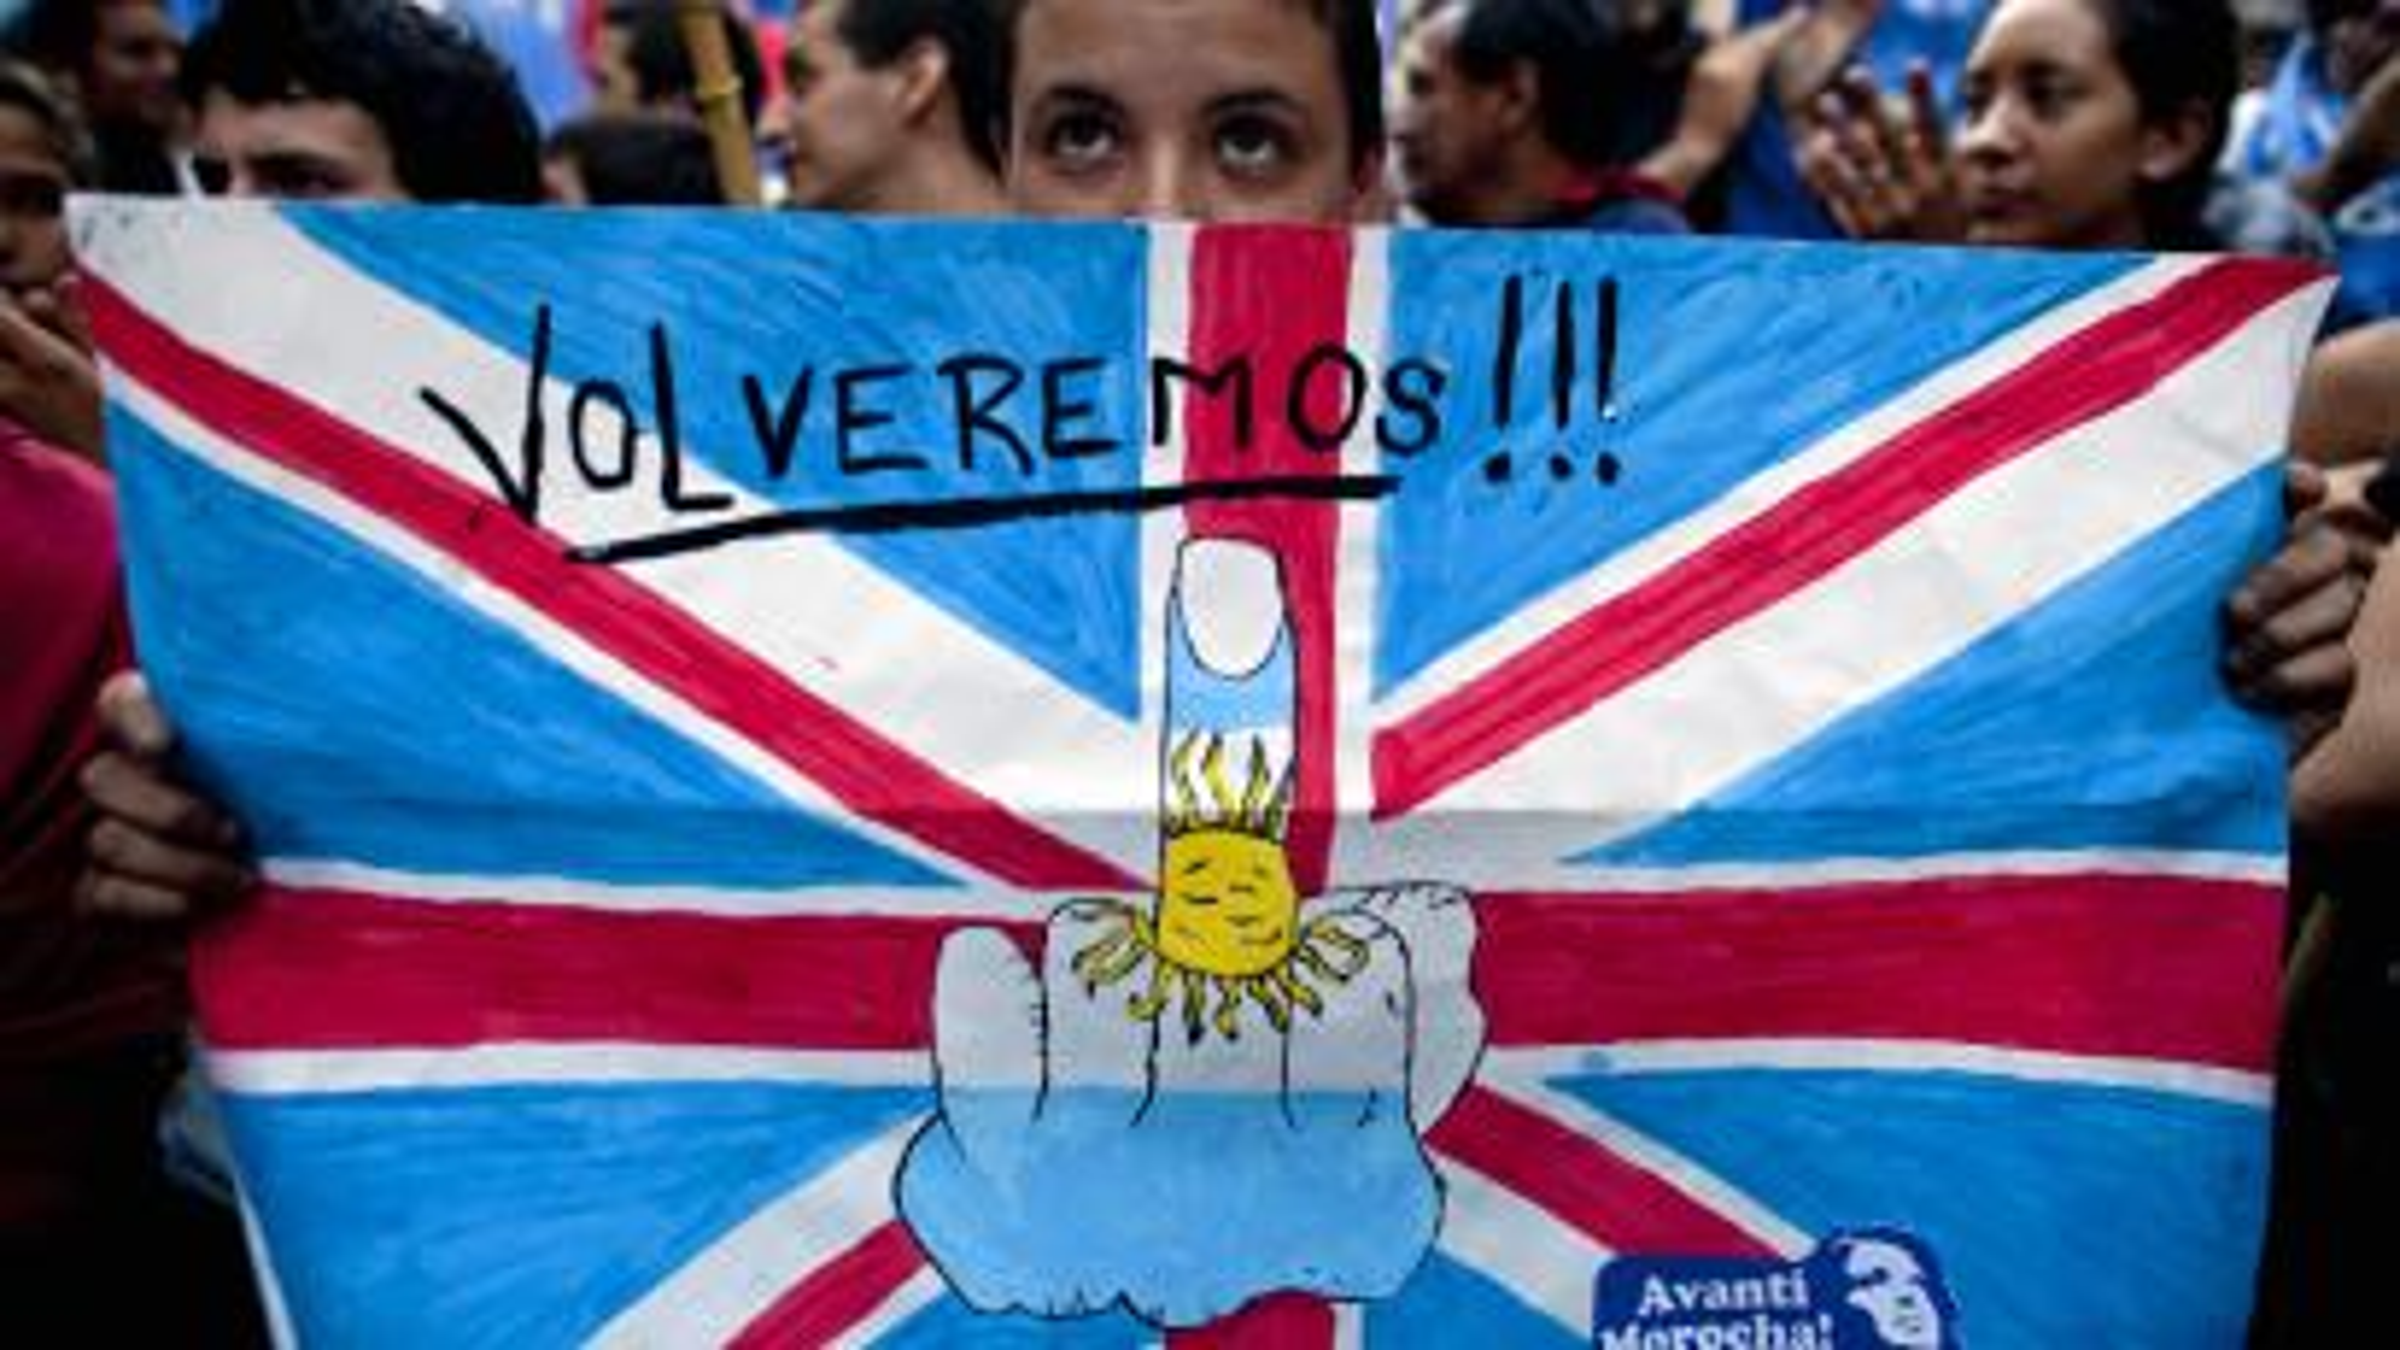 Argentina Protests Falkland Islands